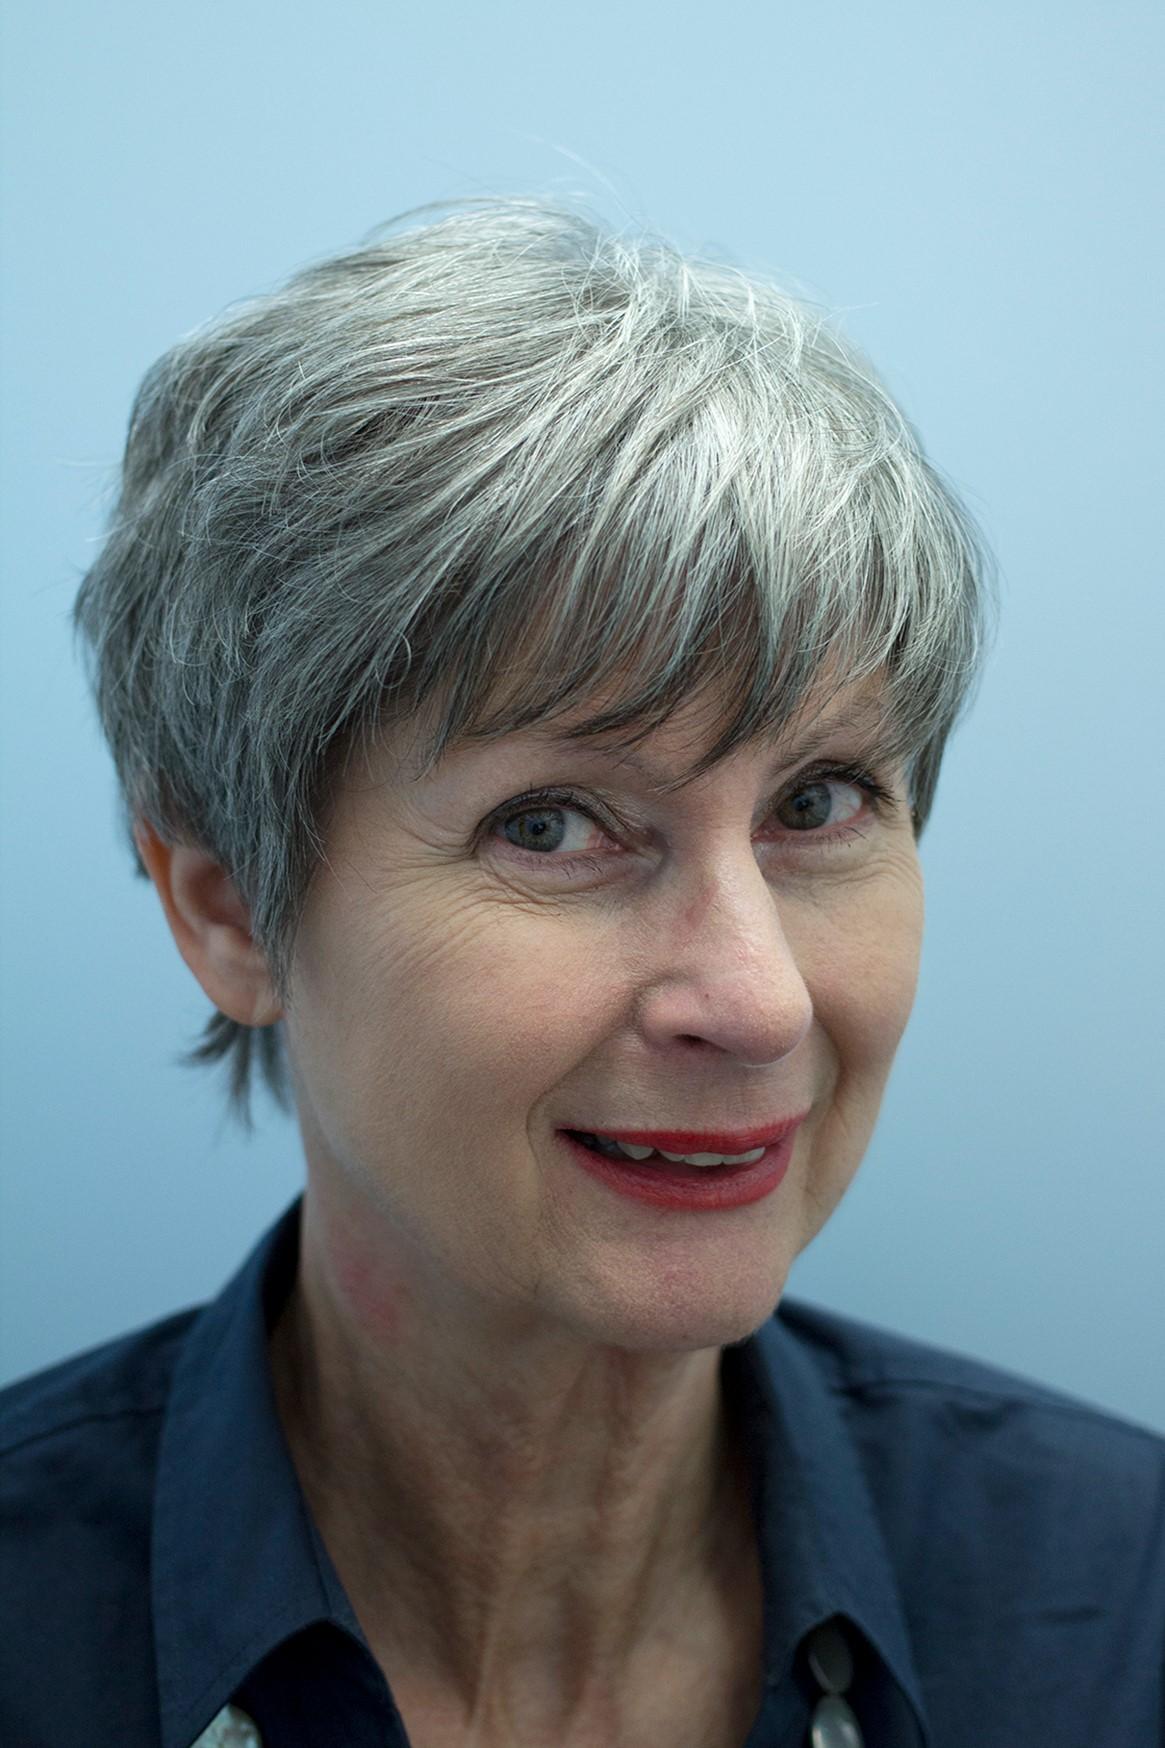 Isolde Schaffter-Wieland